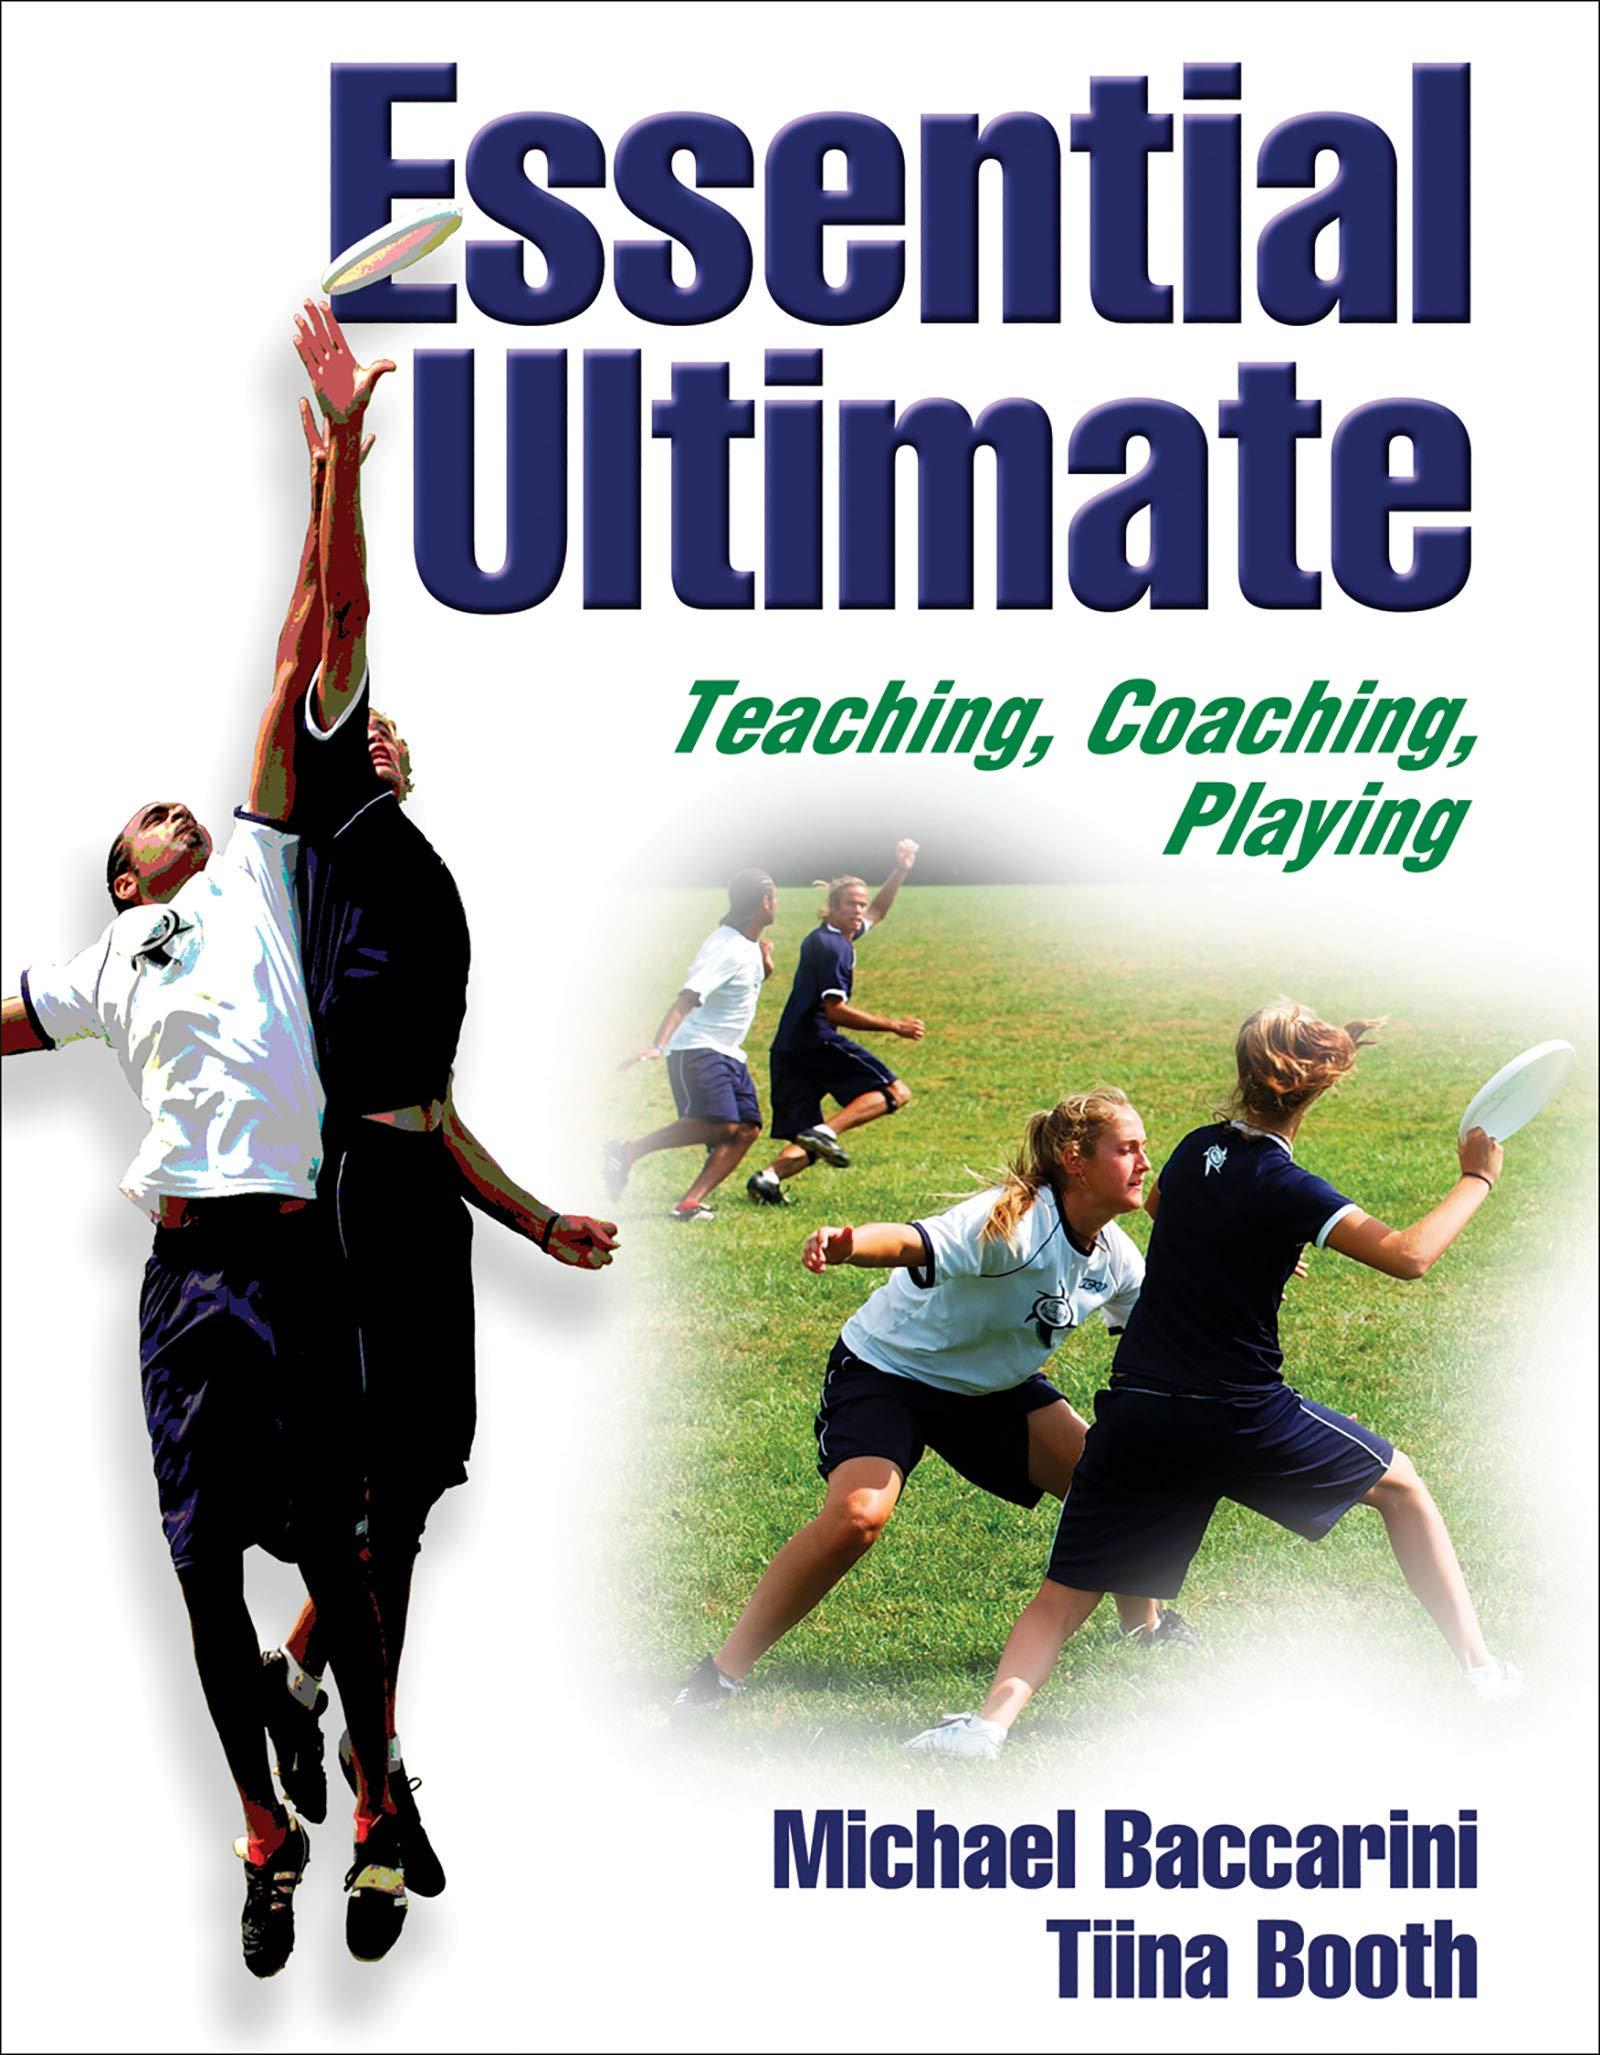 Essential Ultimate: Teaching, Coaching, Playing: Michael Baccarini, Tiina  Booth: 9780736050937: Amazon.com: Books